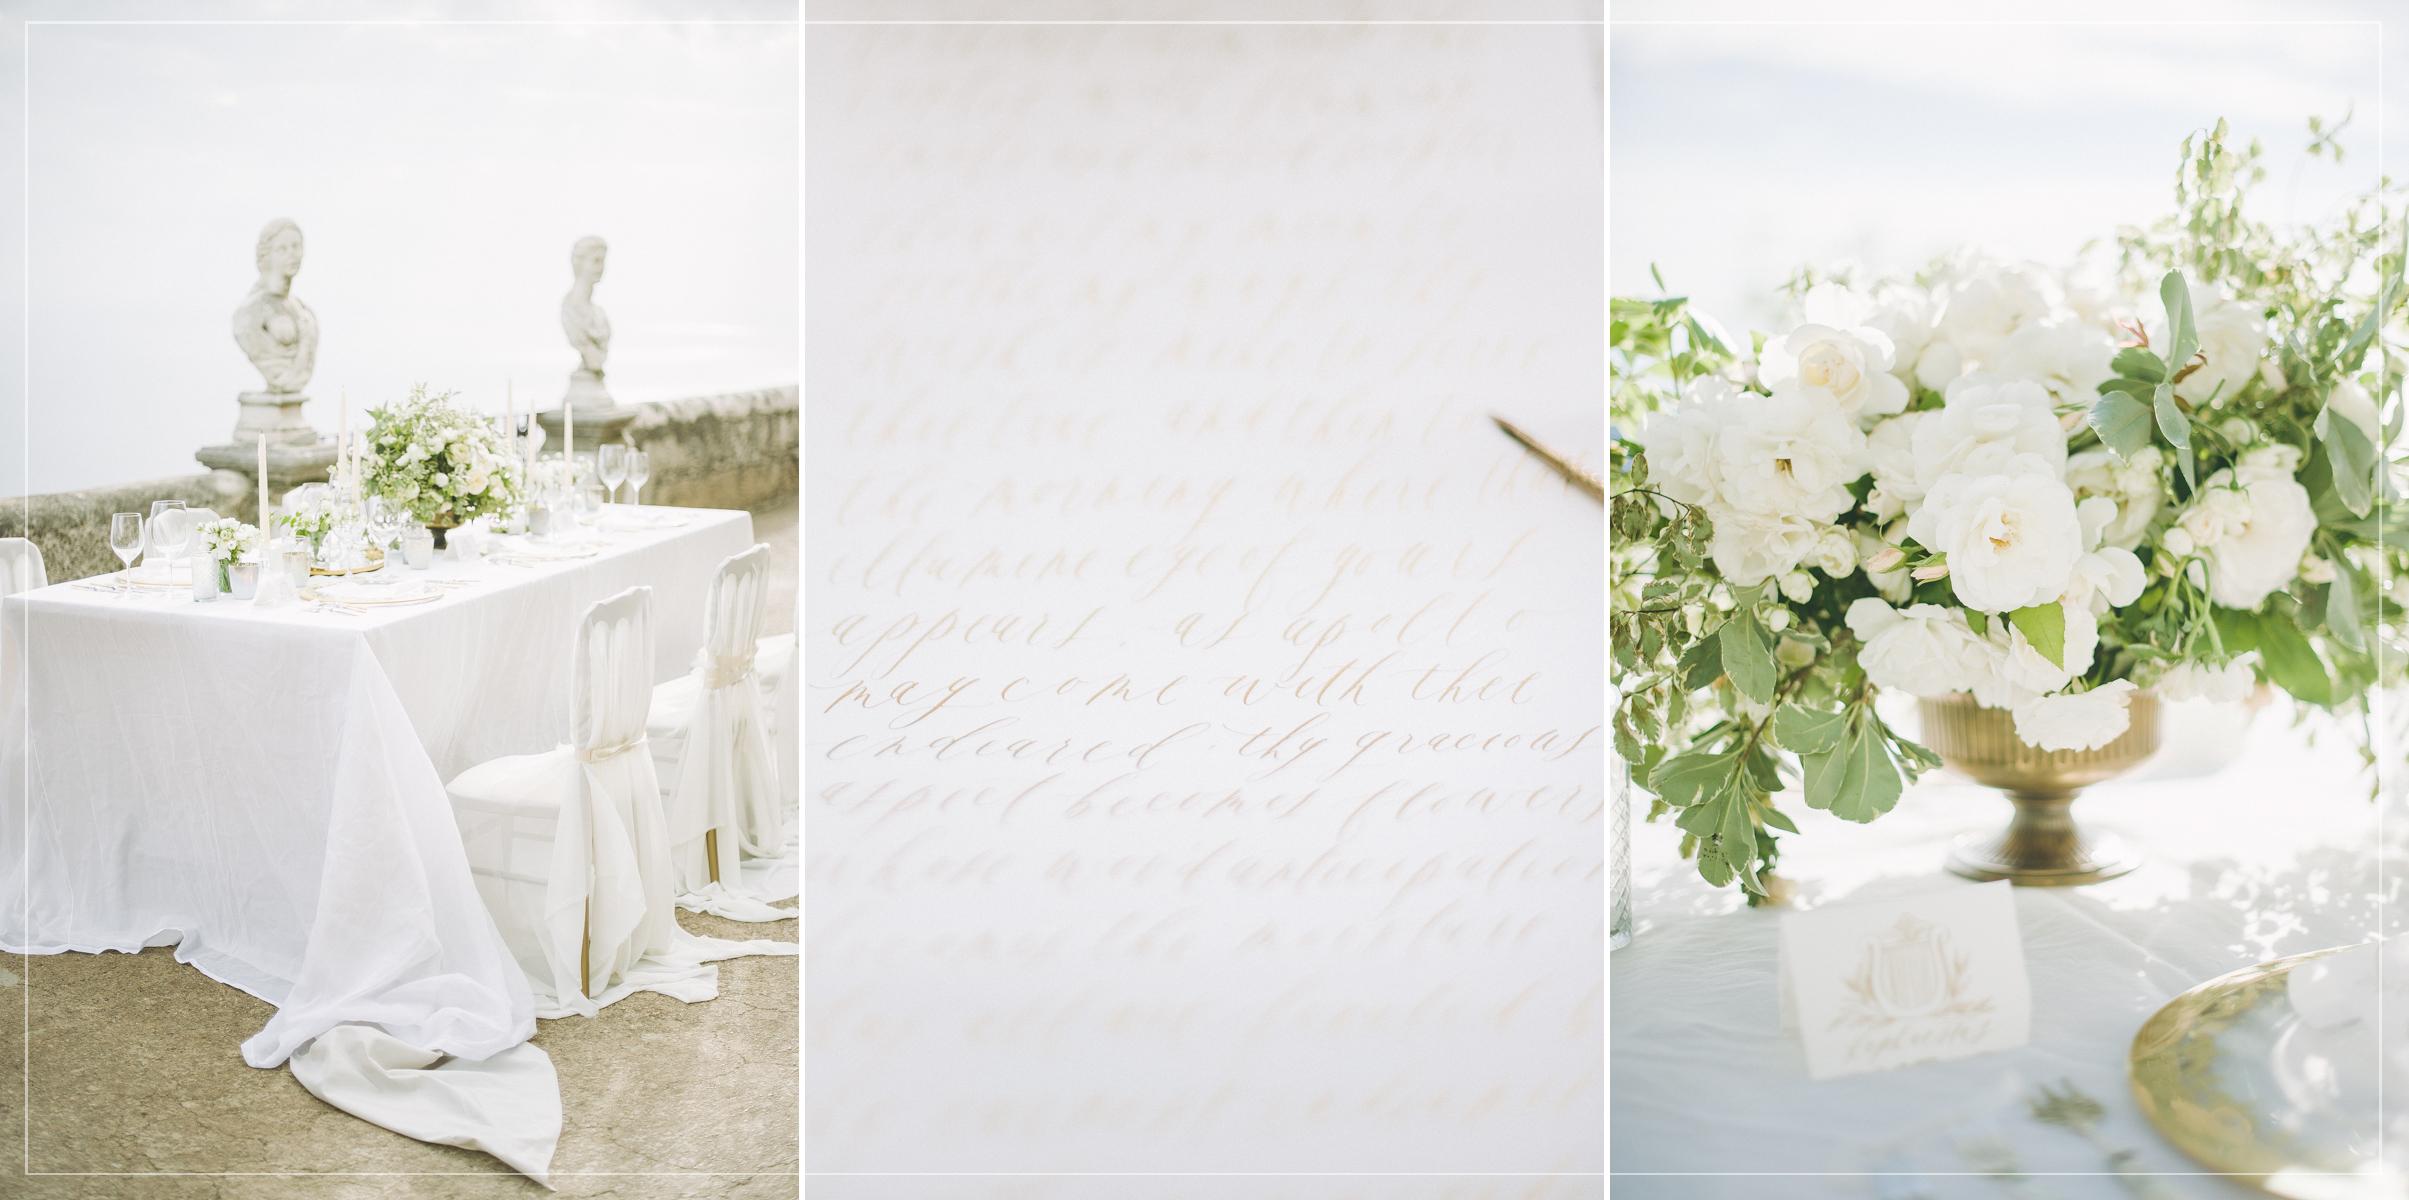 claratuma-home-wedding-03.jpg